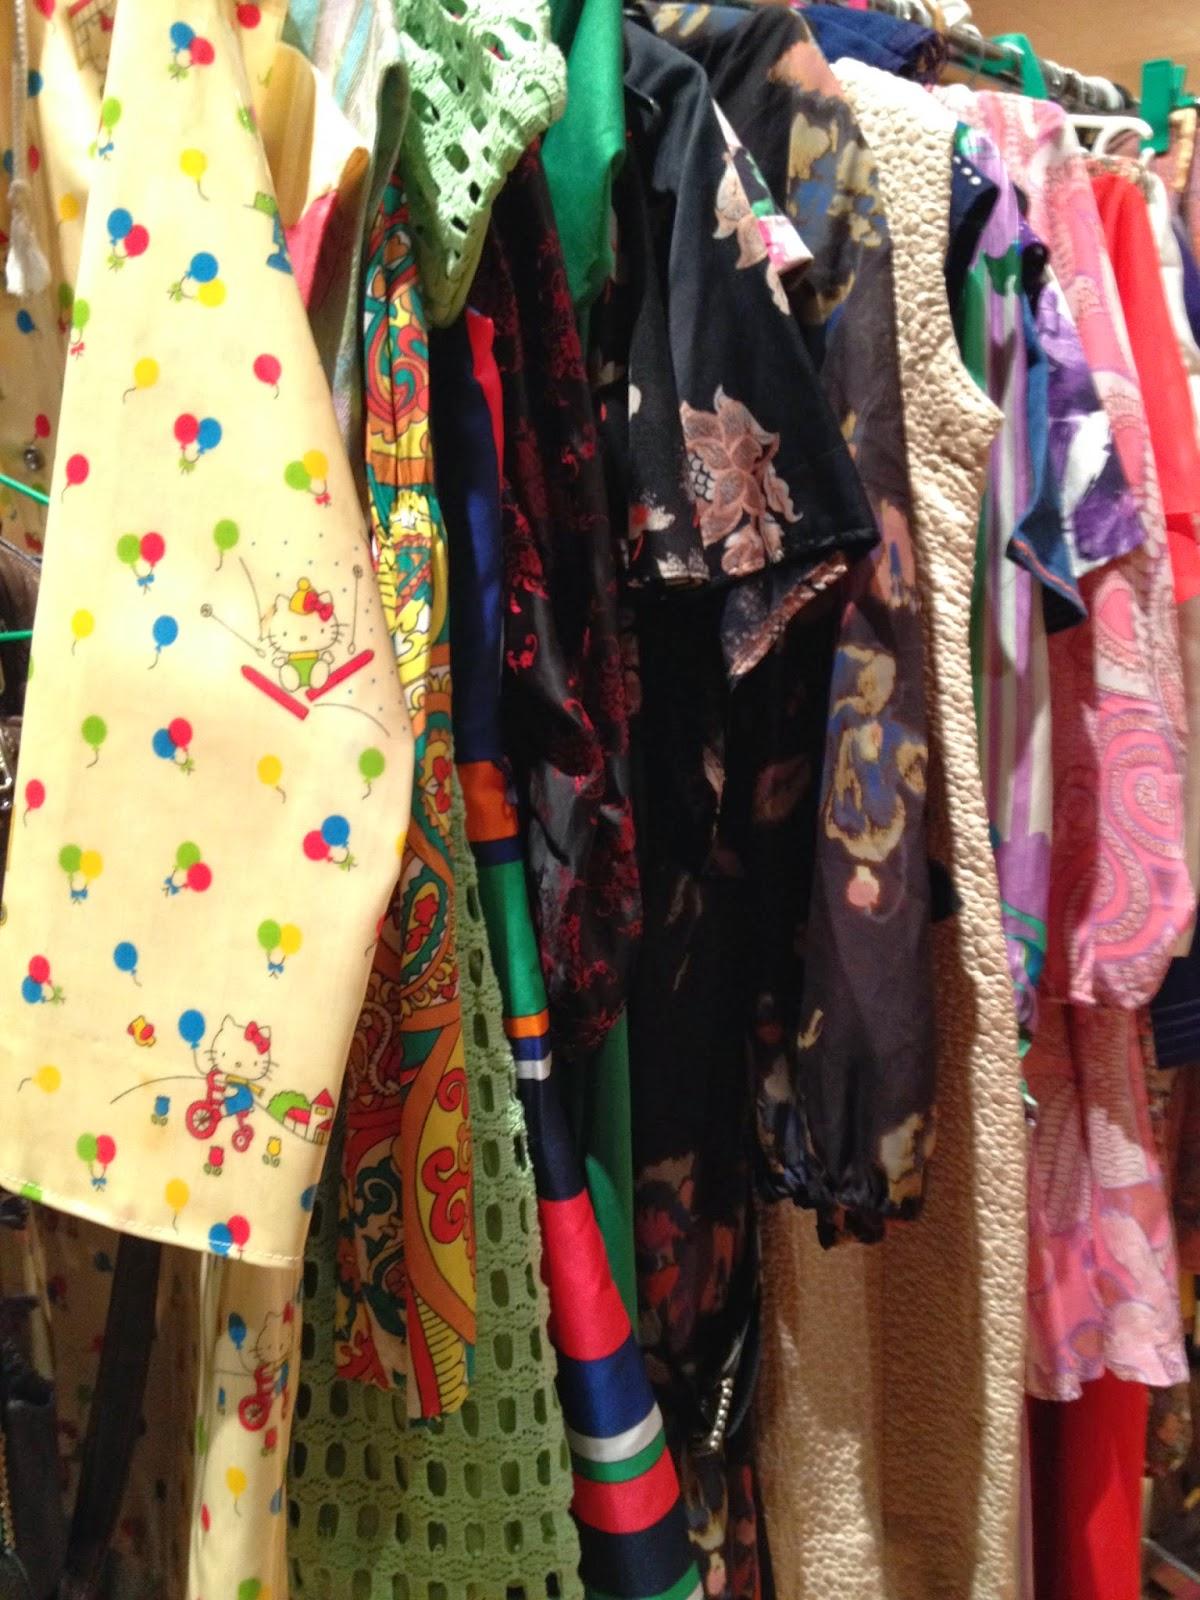 the sunday market Bilbao detalle puesto ropa segunda mano